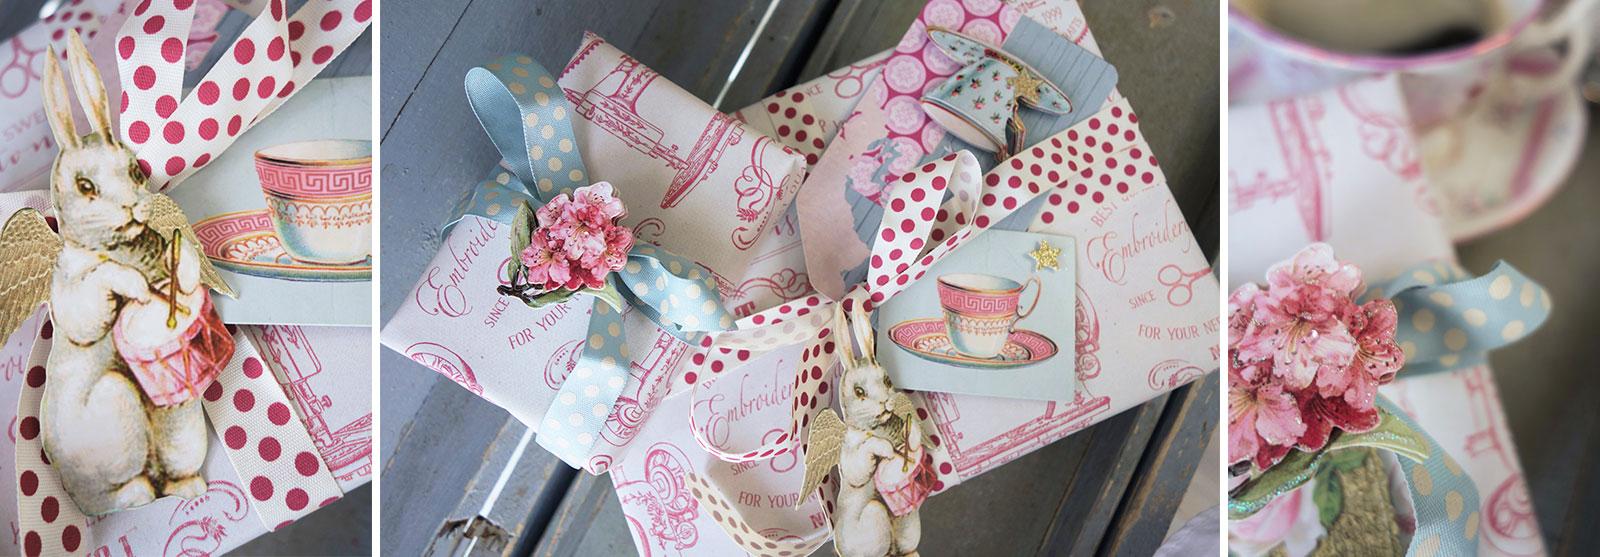 Tiny-Treasures-gift-wrap